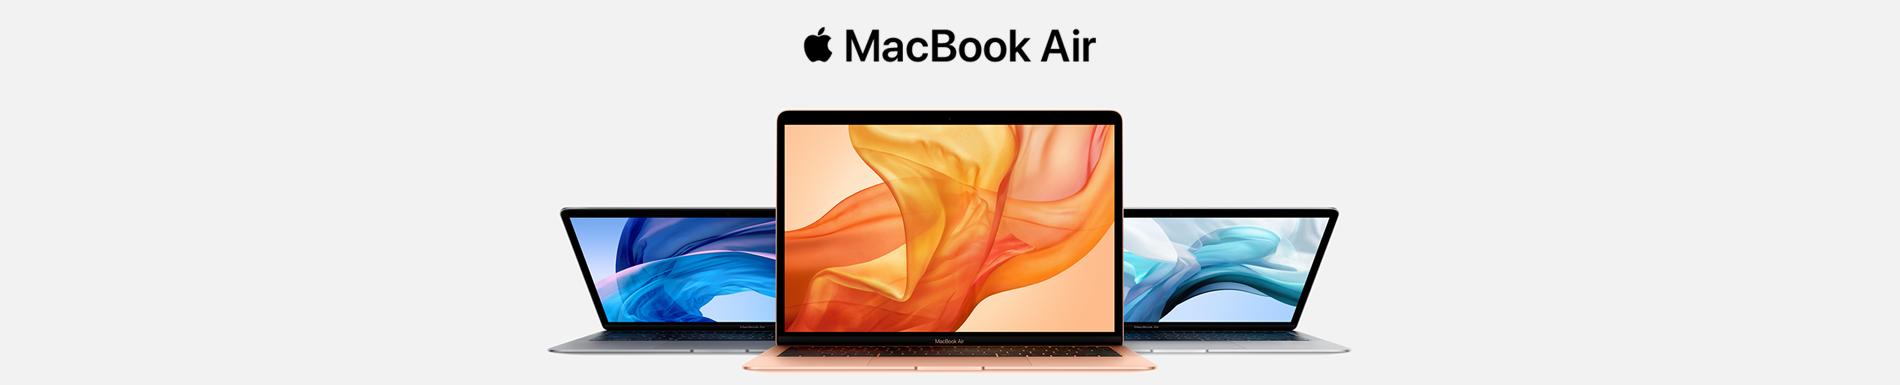 Category Mac - Macbook Air - Slide 1